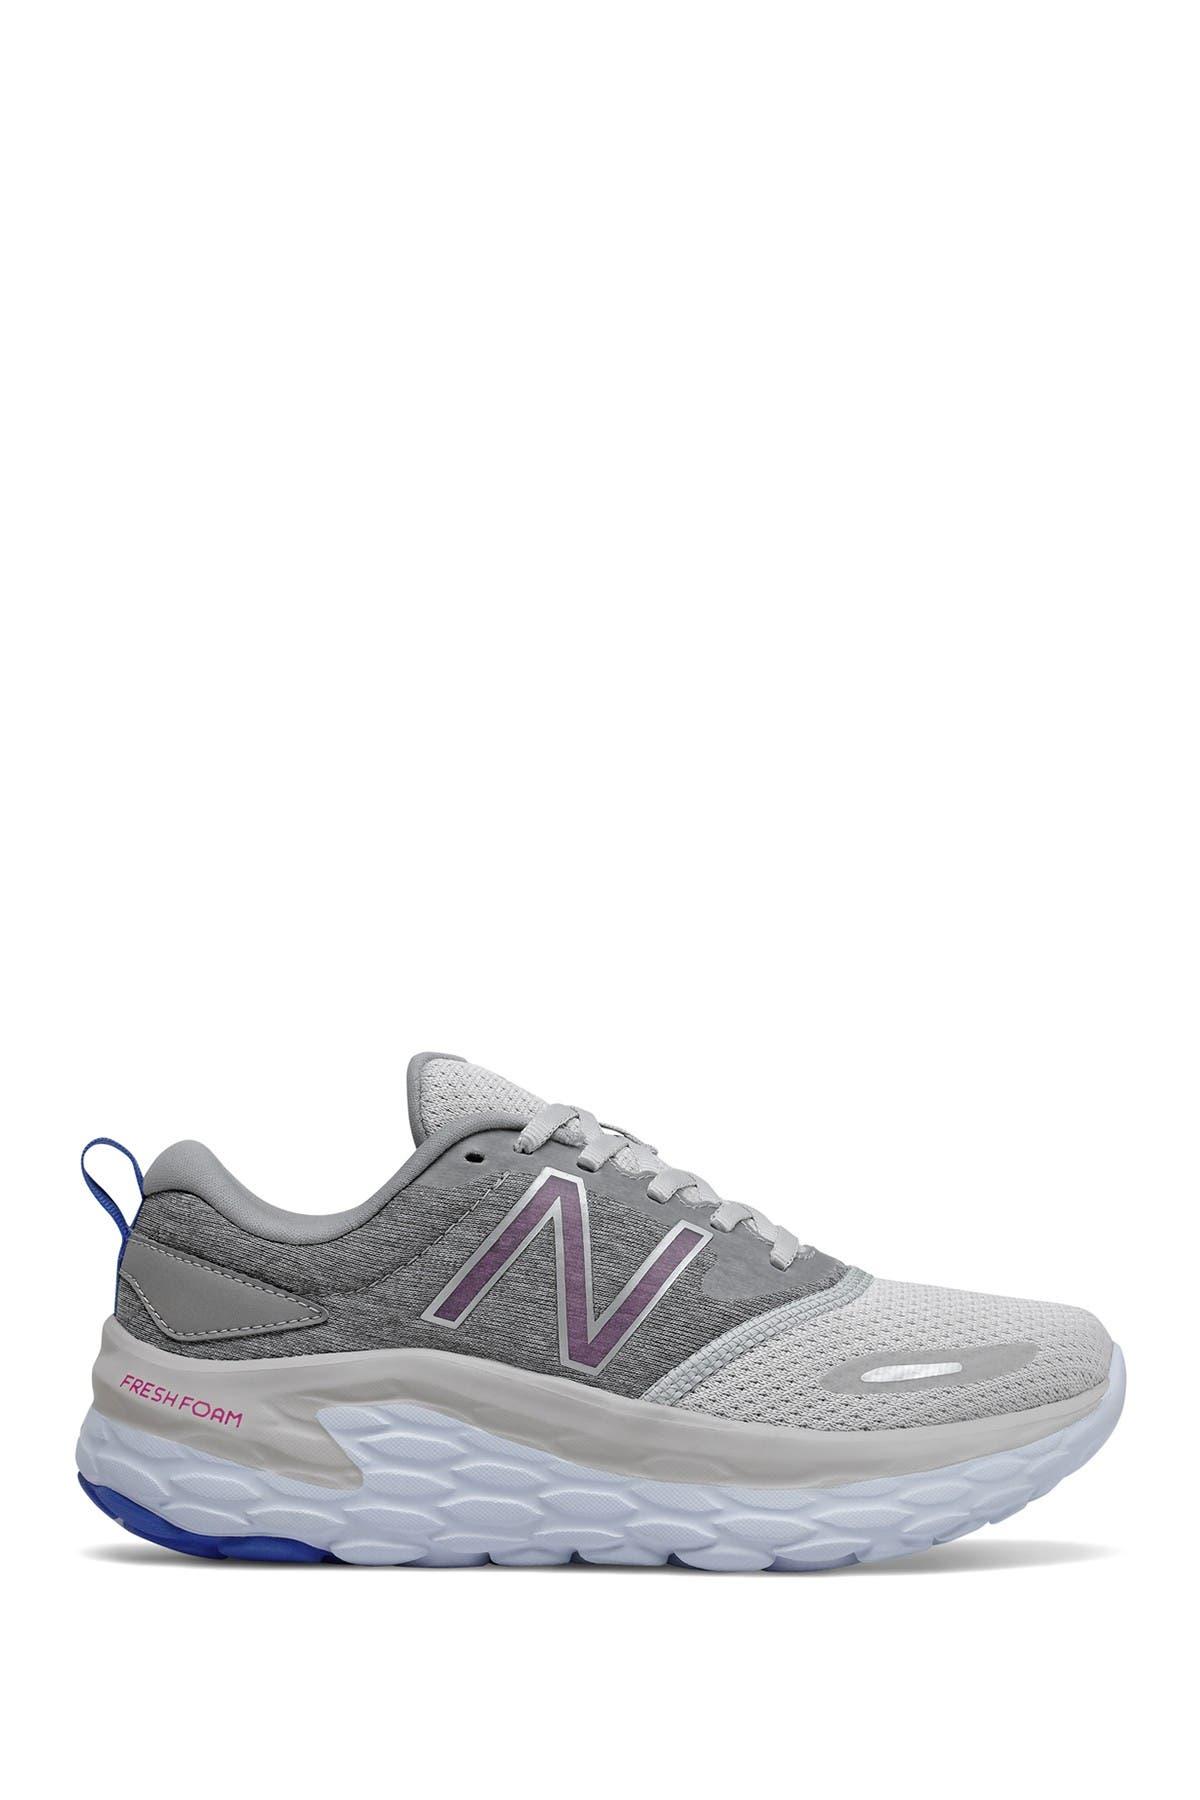 Image of New Balance Aloth Running Shoe